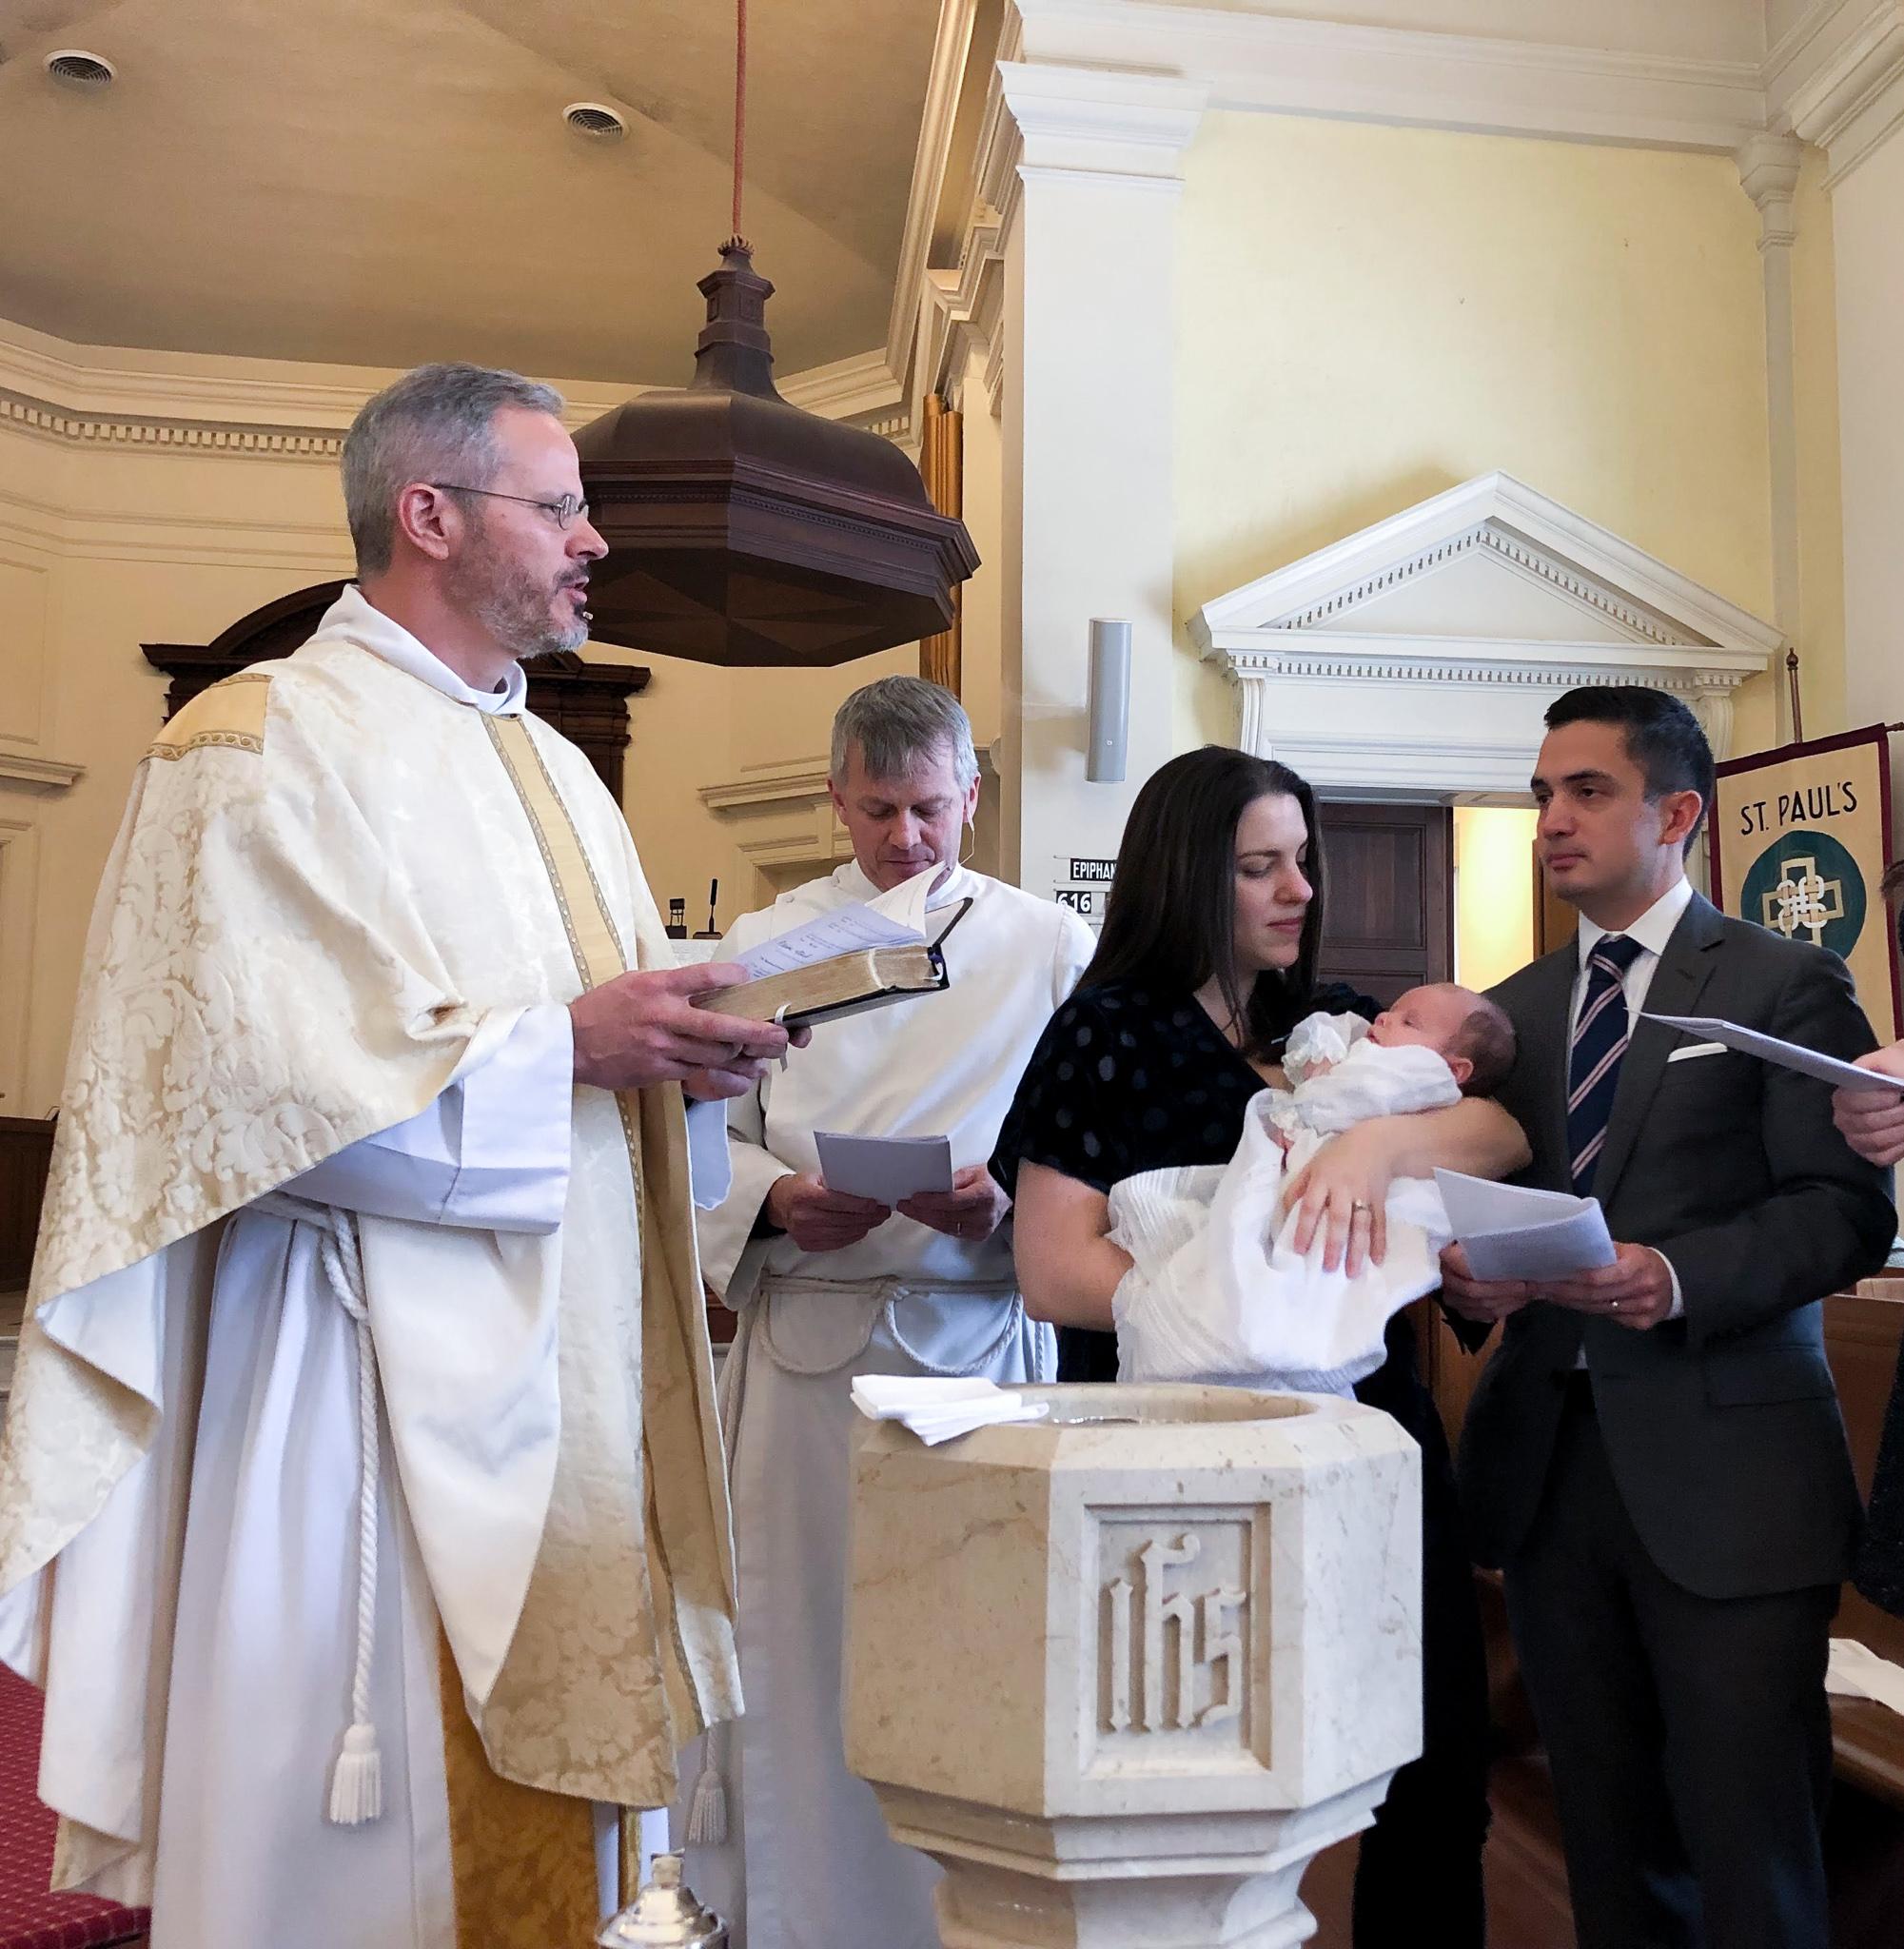 Newborn being baptized at St. Paul's Memorial church.